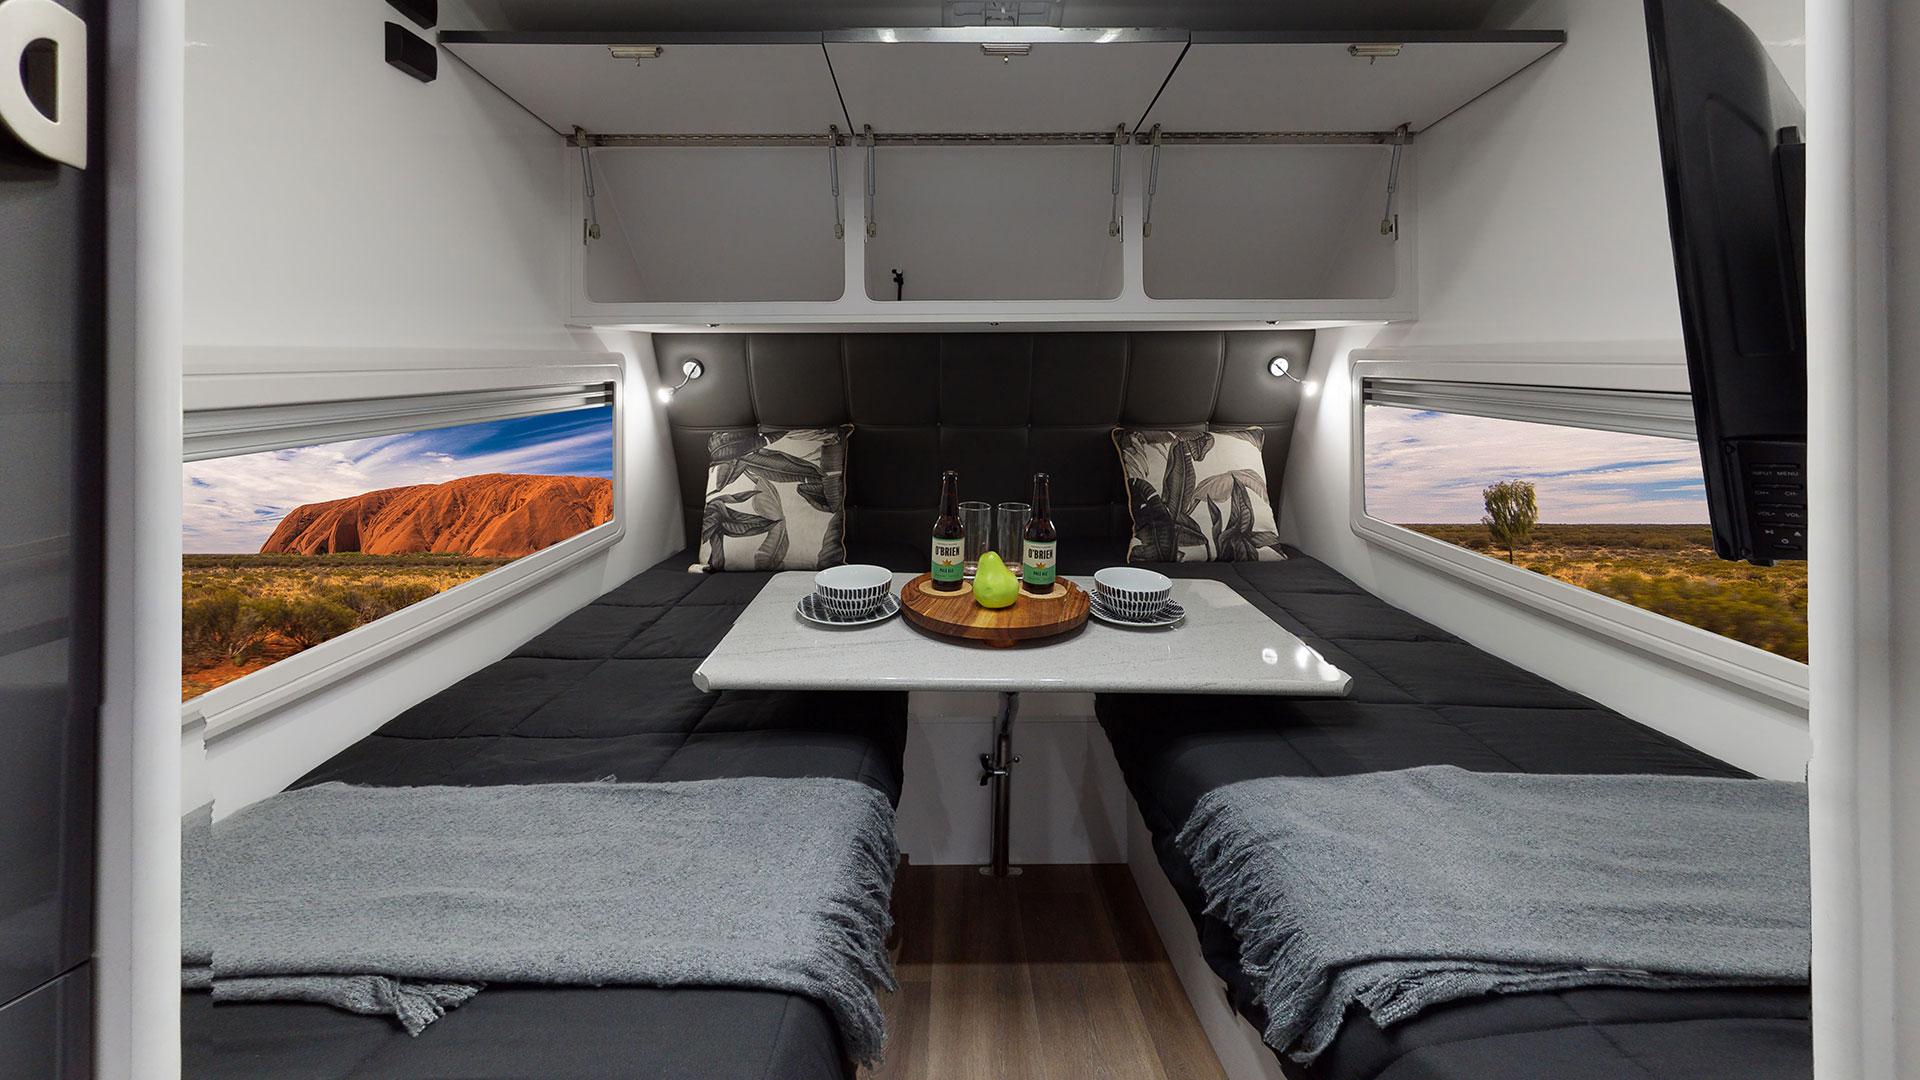 Breakfast in bed anyone?